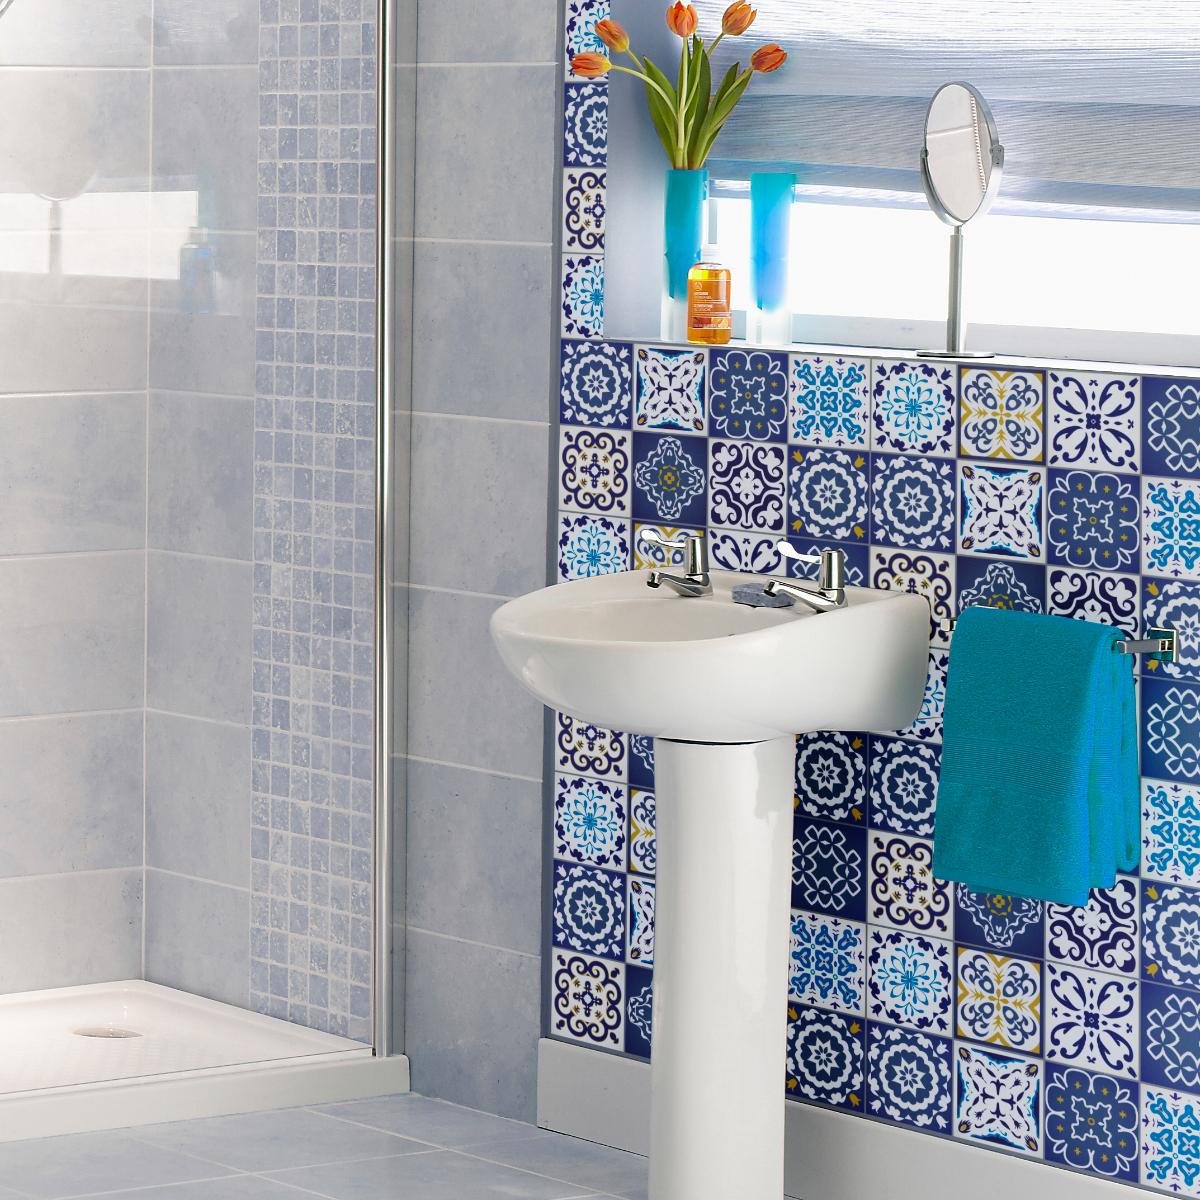 12 stickers carrelages azulejos janeiro cuisine. Black Bedroom Furniture Sets. Home Design Ideas